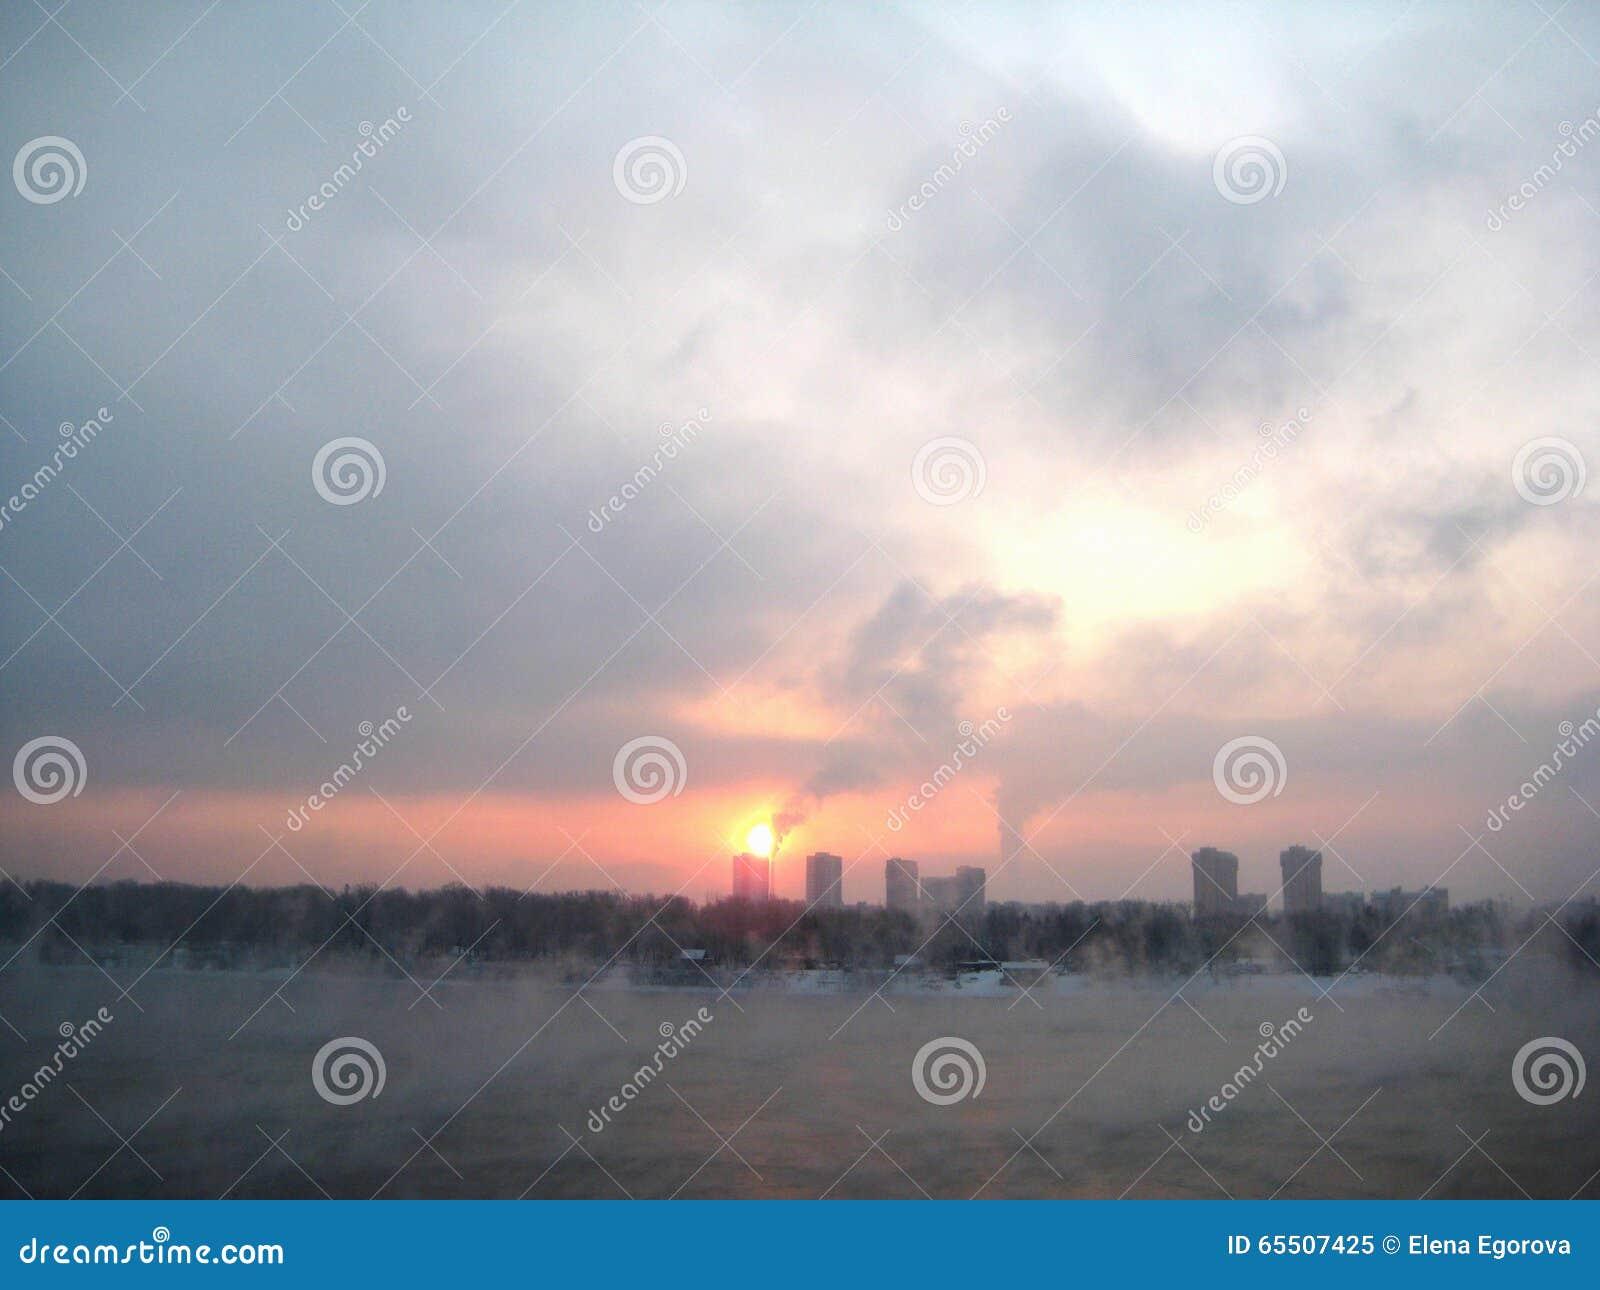 Fog Morning Sky City Building Industrial Pollution Royalty ...